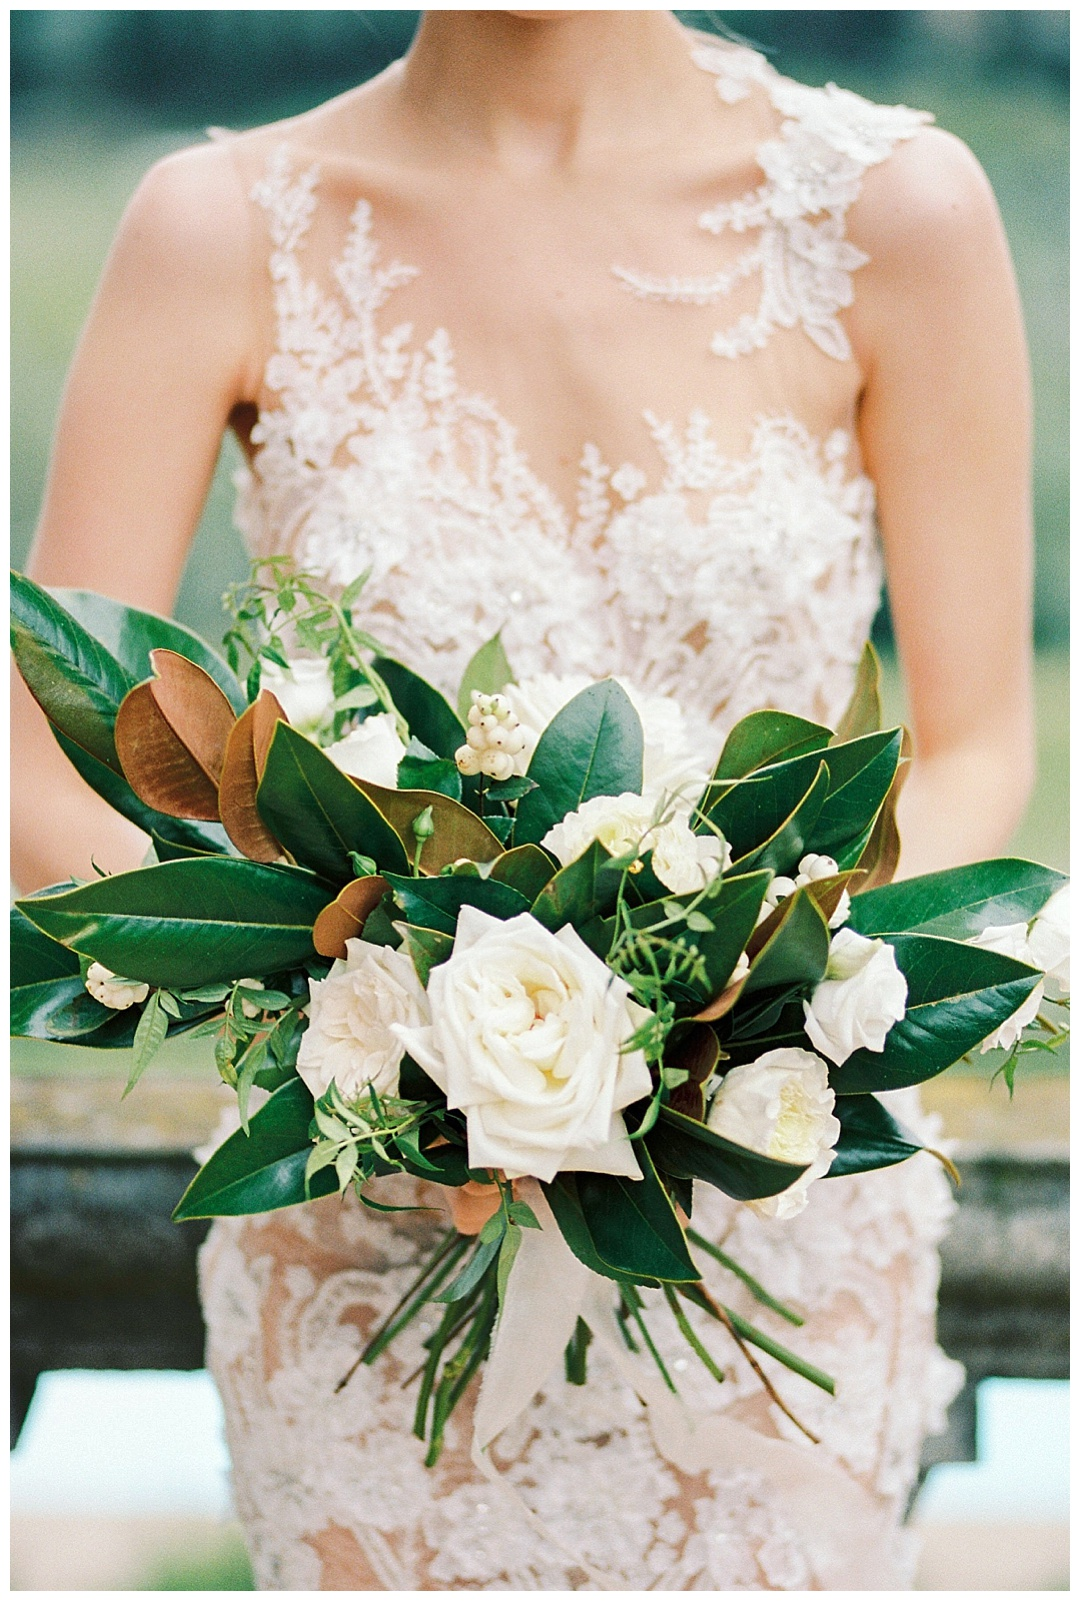 We_Can _Be_Heroes_alternative_wedding_photographer_Tuscany_wedding_film_0043